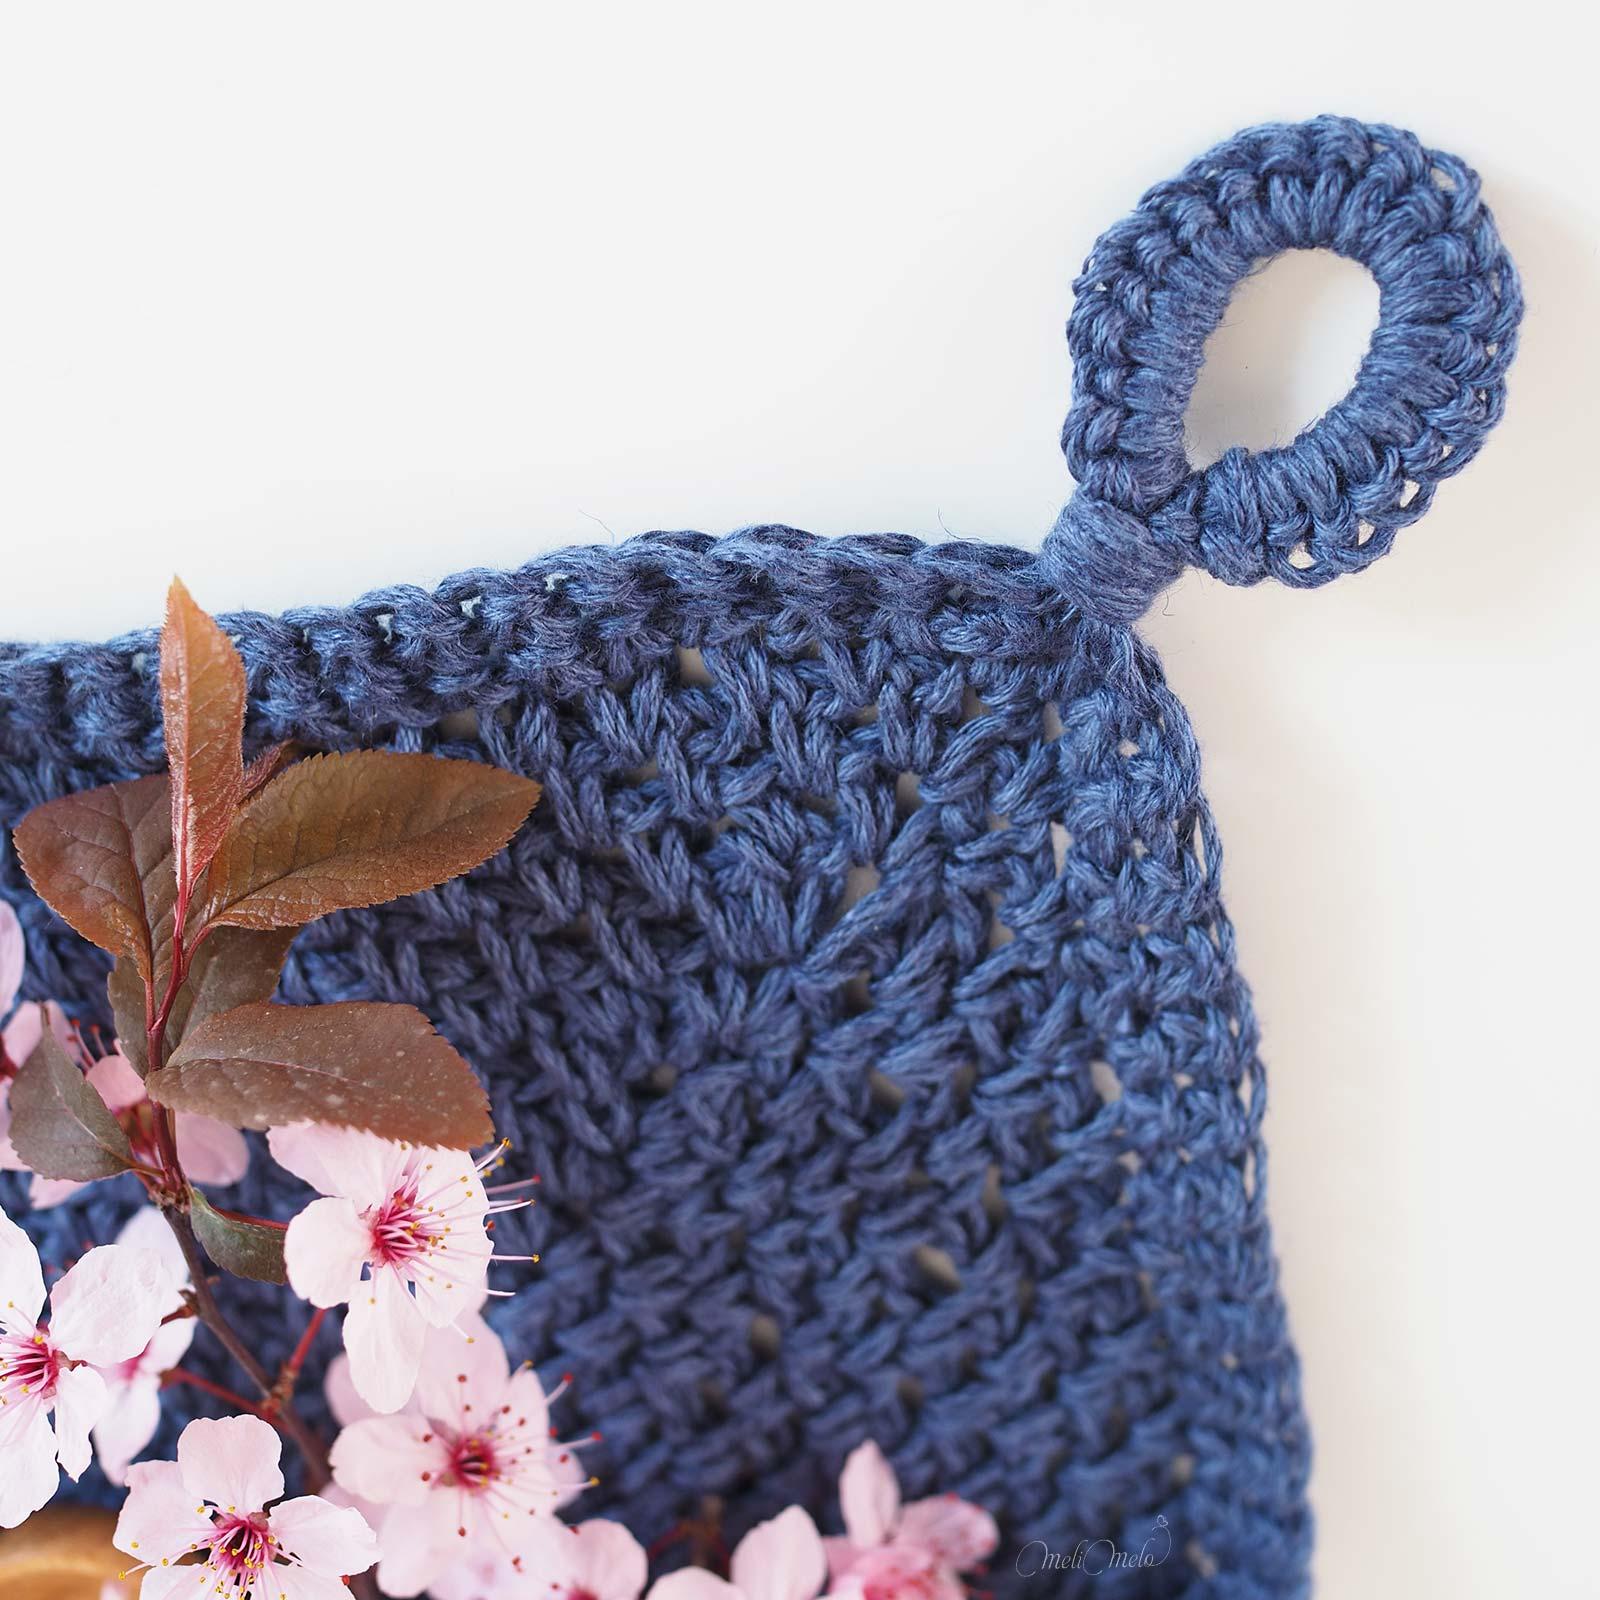 crochet-hook-bramble-basket-drops-bomull-lin-laboutiquedemelimelo